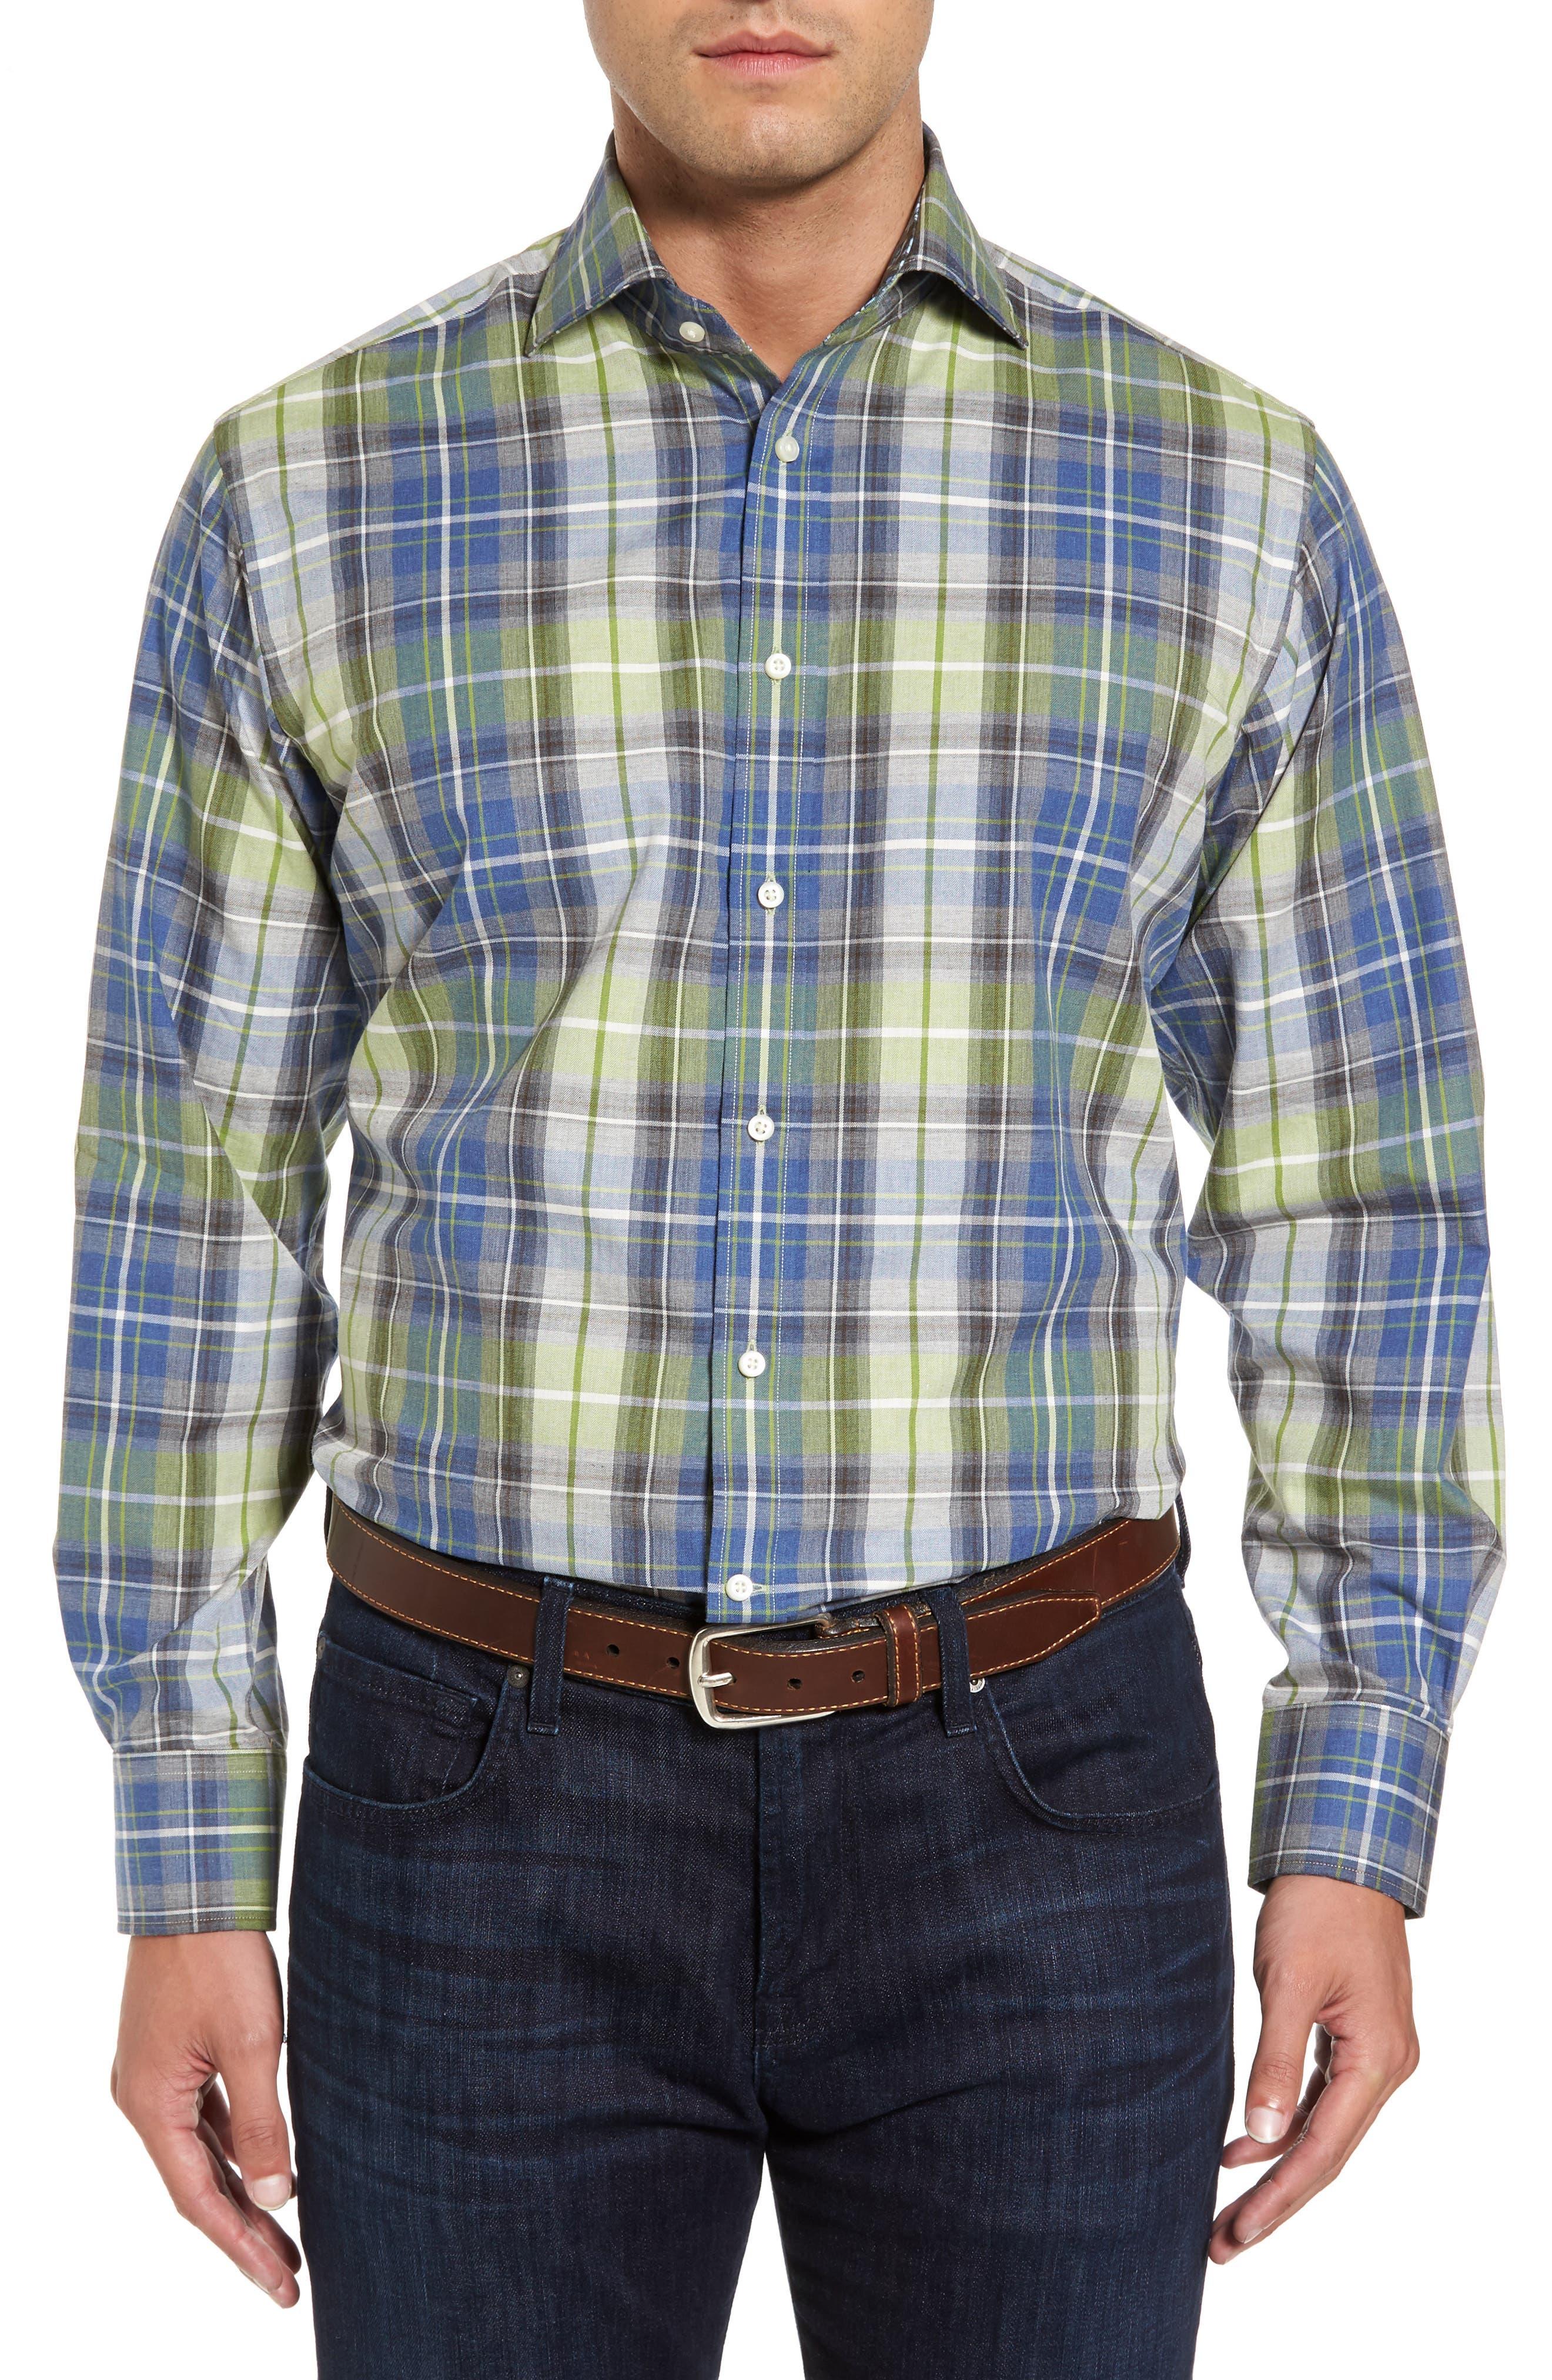 Alternate Image 1 Selected - Thomas Dean Regular Fit Plaid Sport Shirt